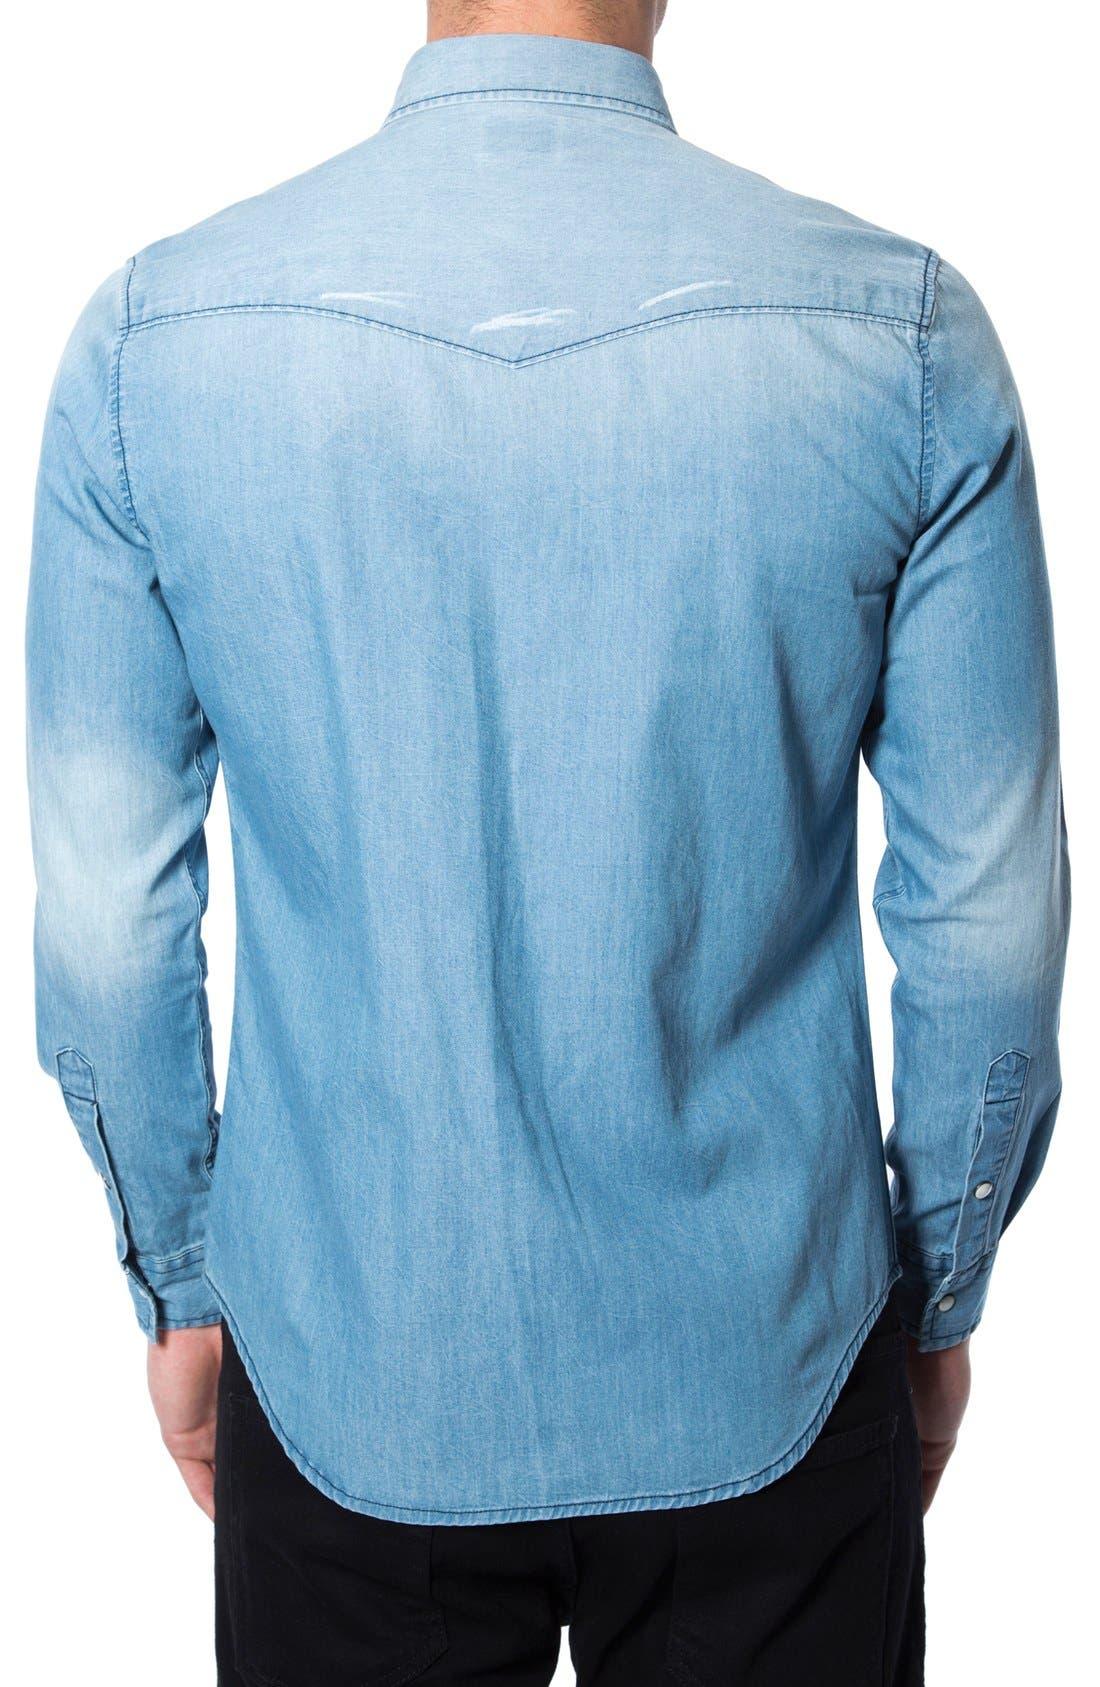 'Beyond Me' Trim Fit Chambray Shirt,                             Alternate thumbnail 2, color,                             400